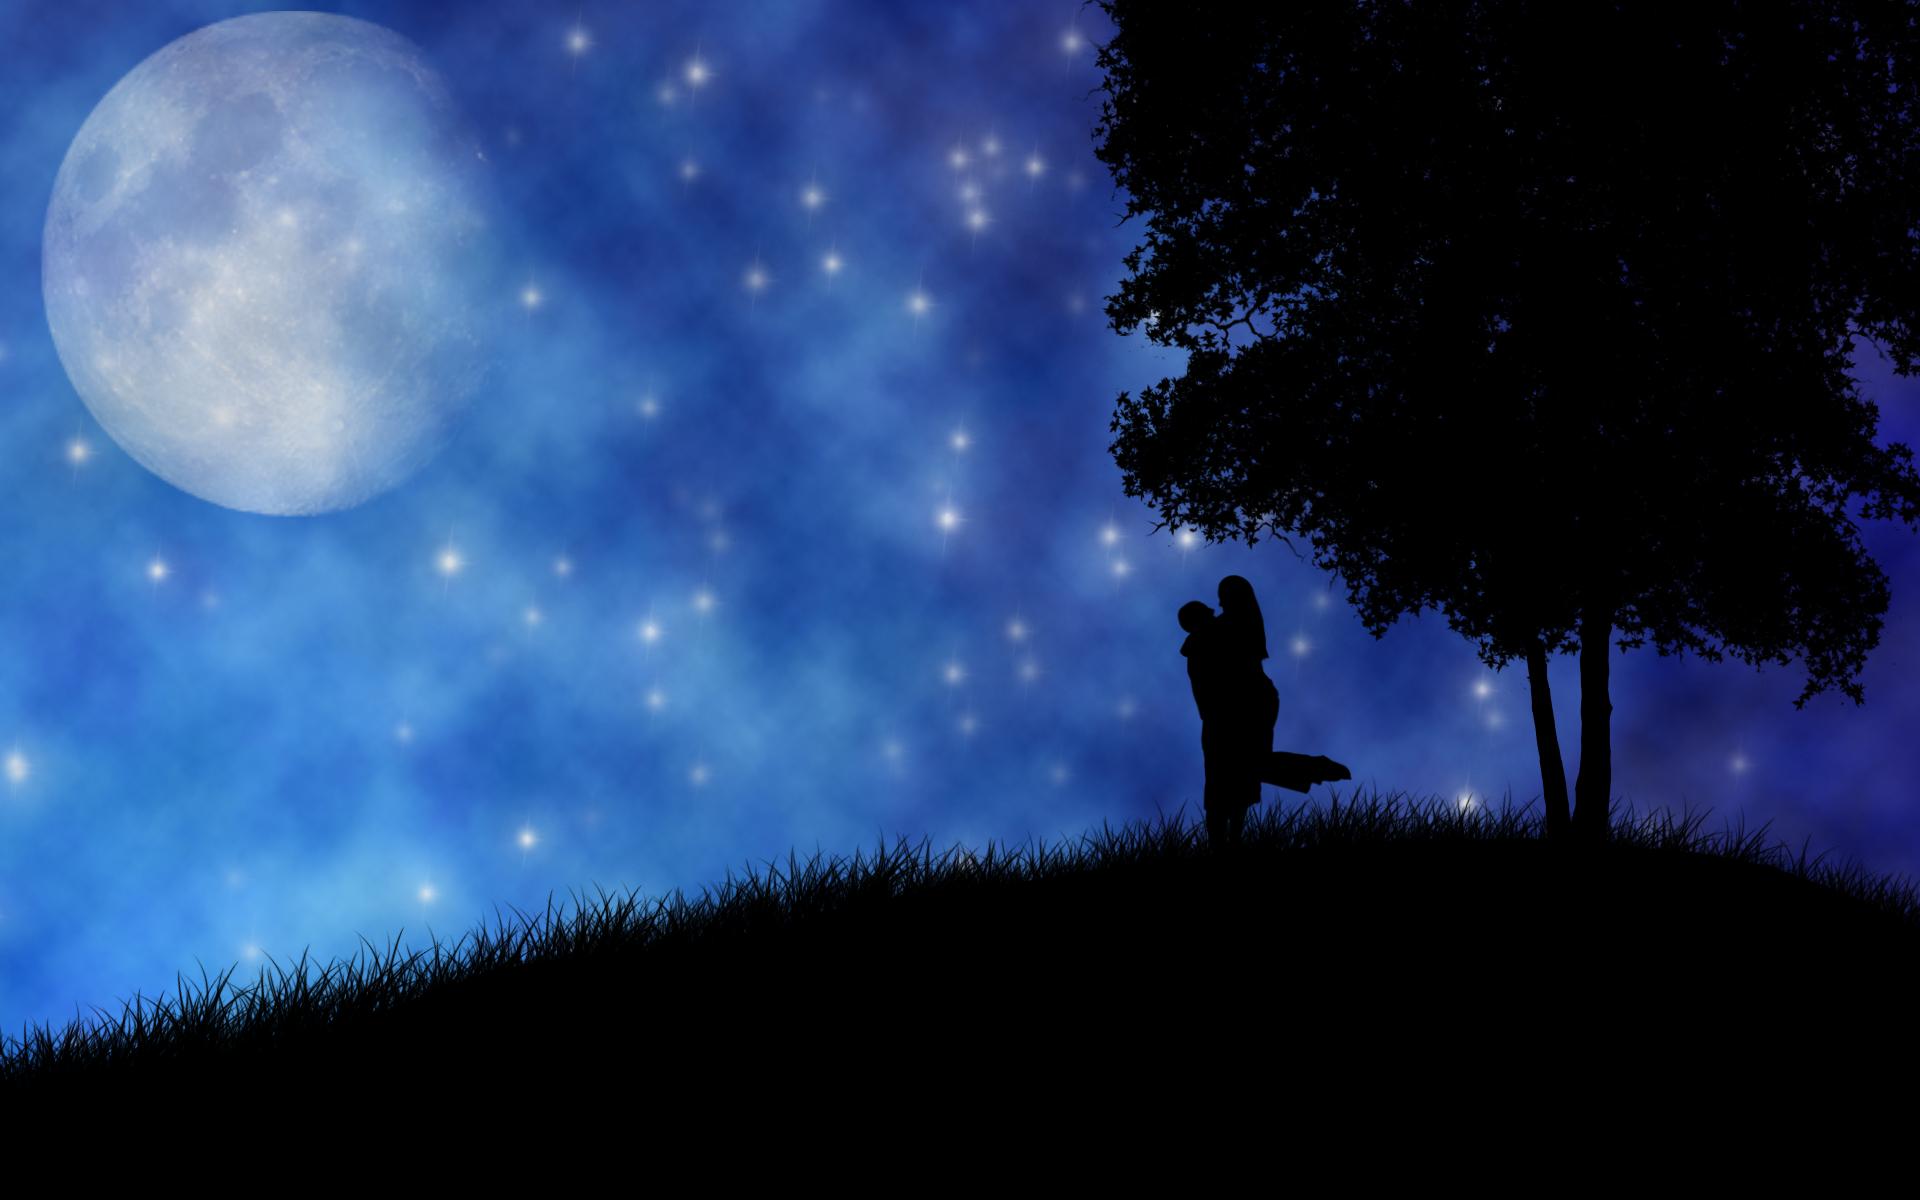 Night Of Love Wallpaper Images : Night Love by Mar0988 on DeviantArt